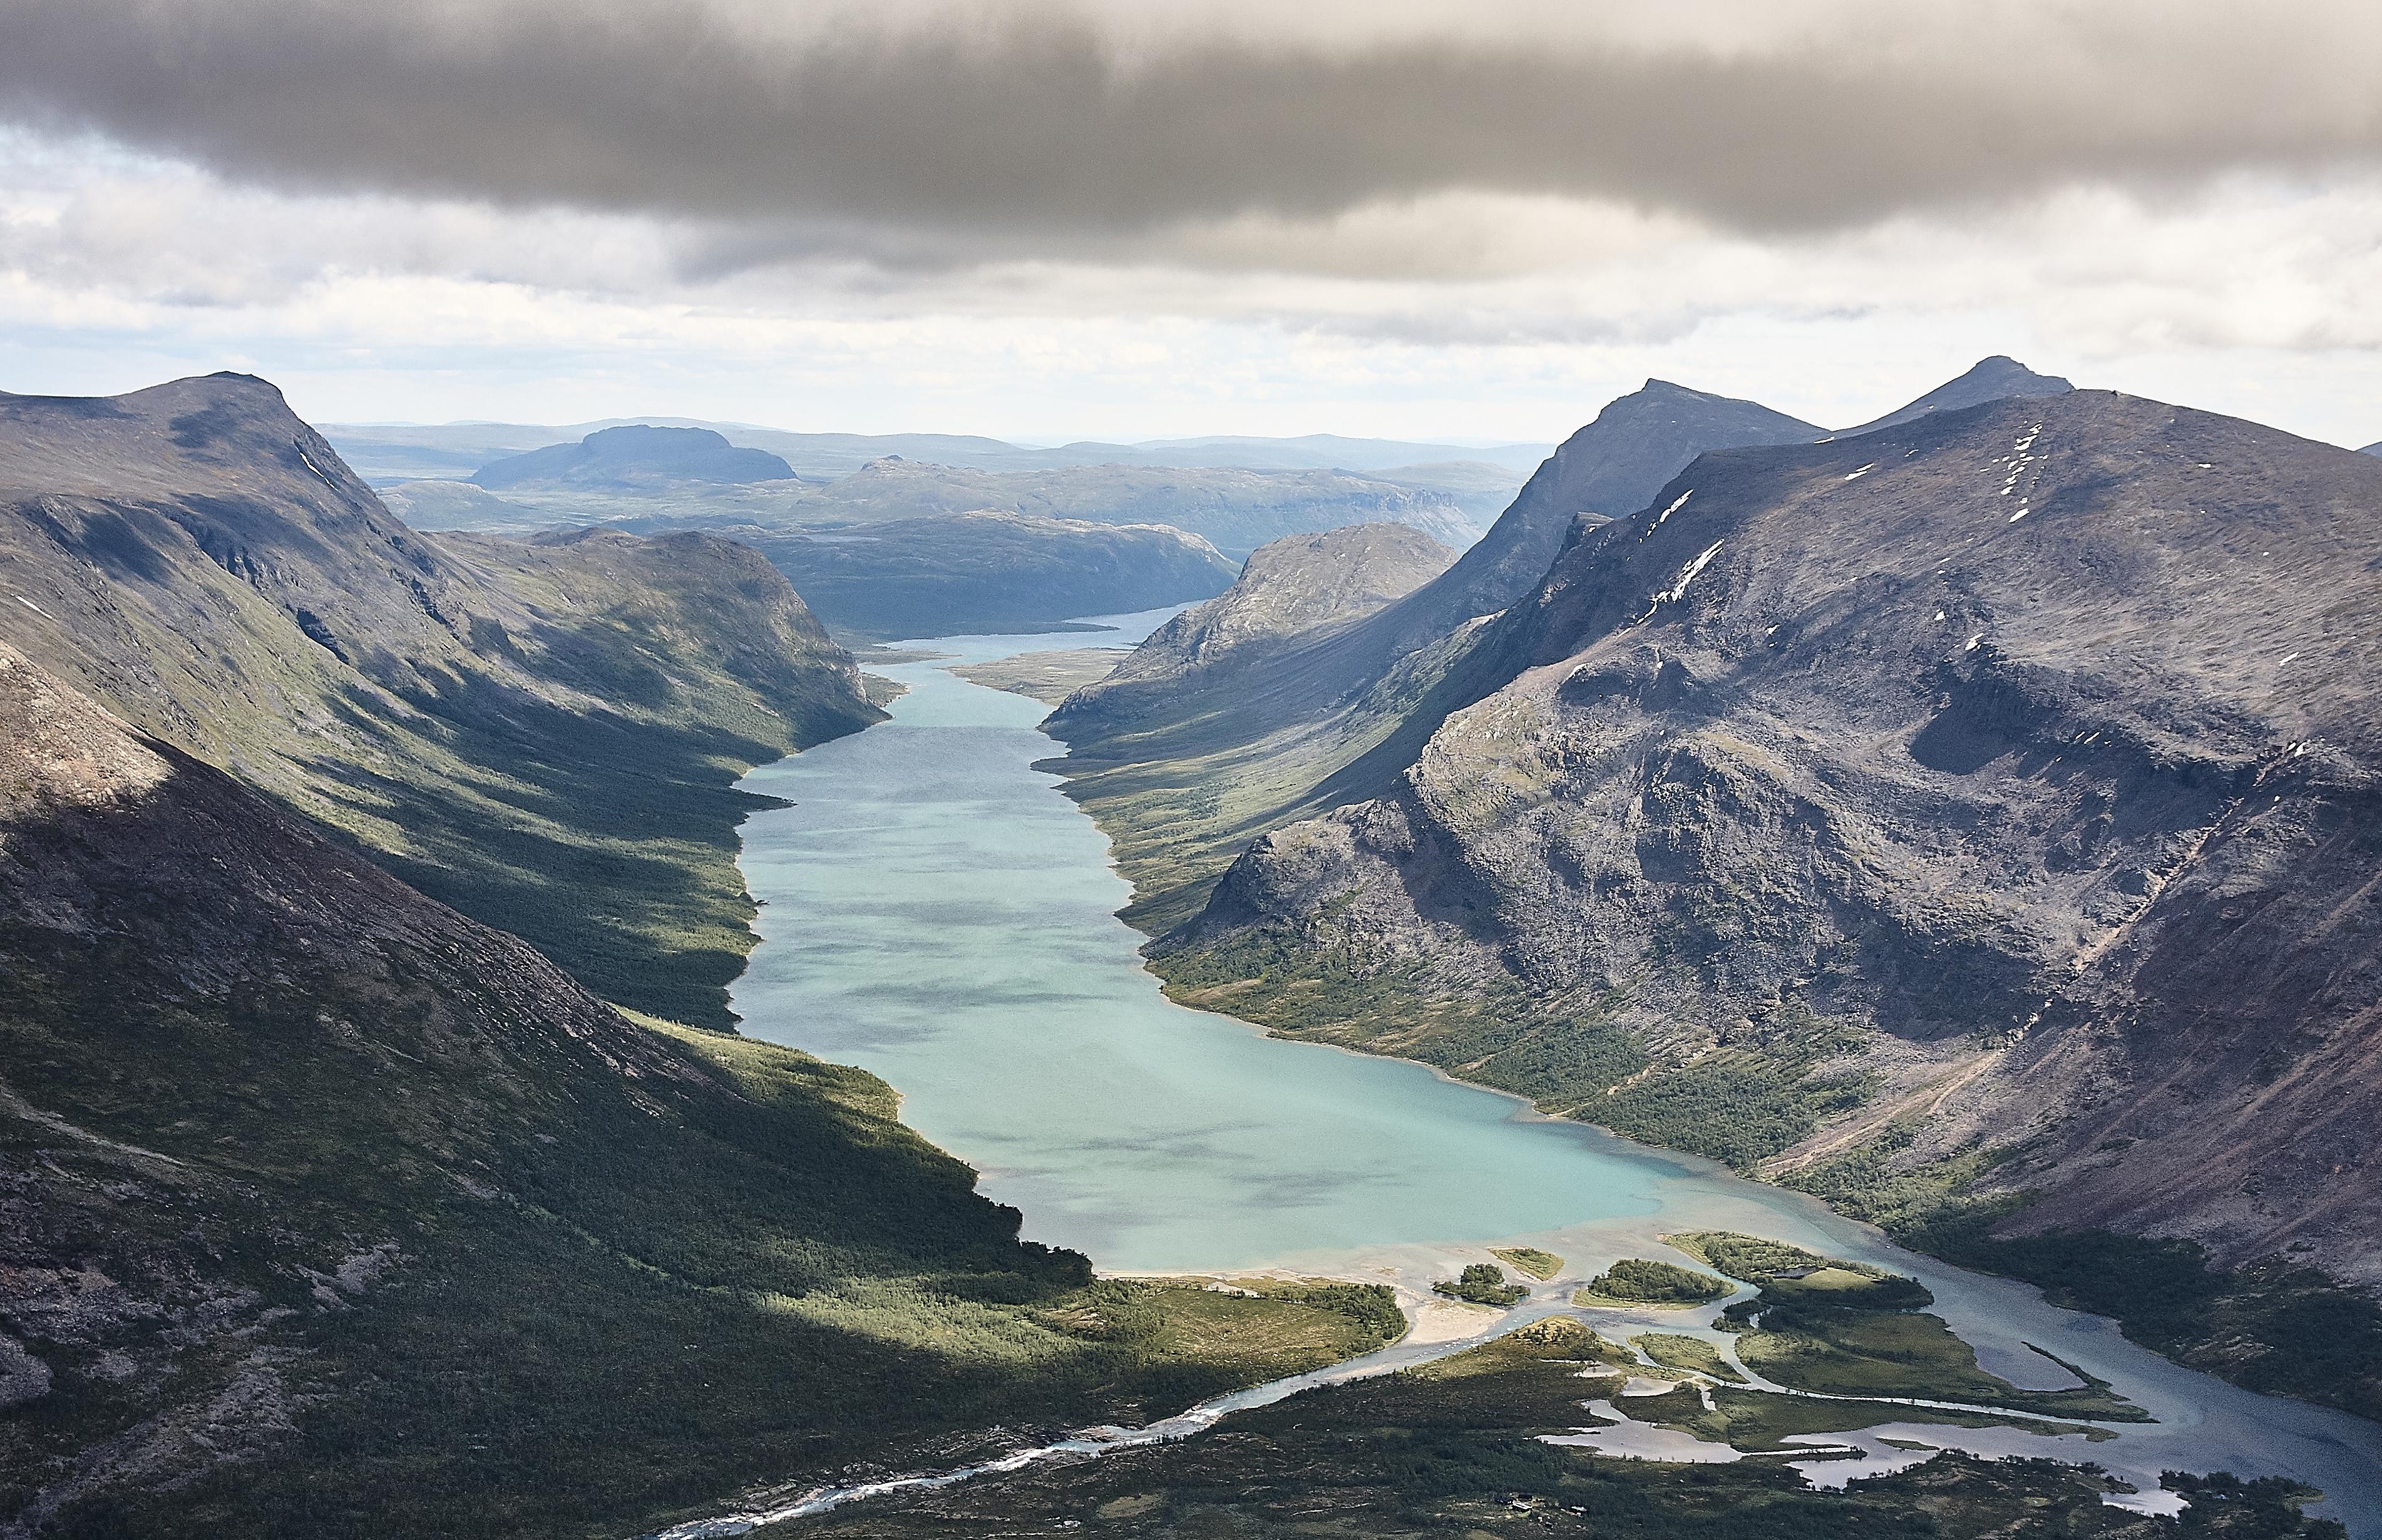 Kungsleden, Day 10 - 31